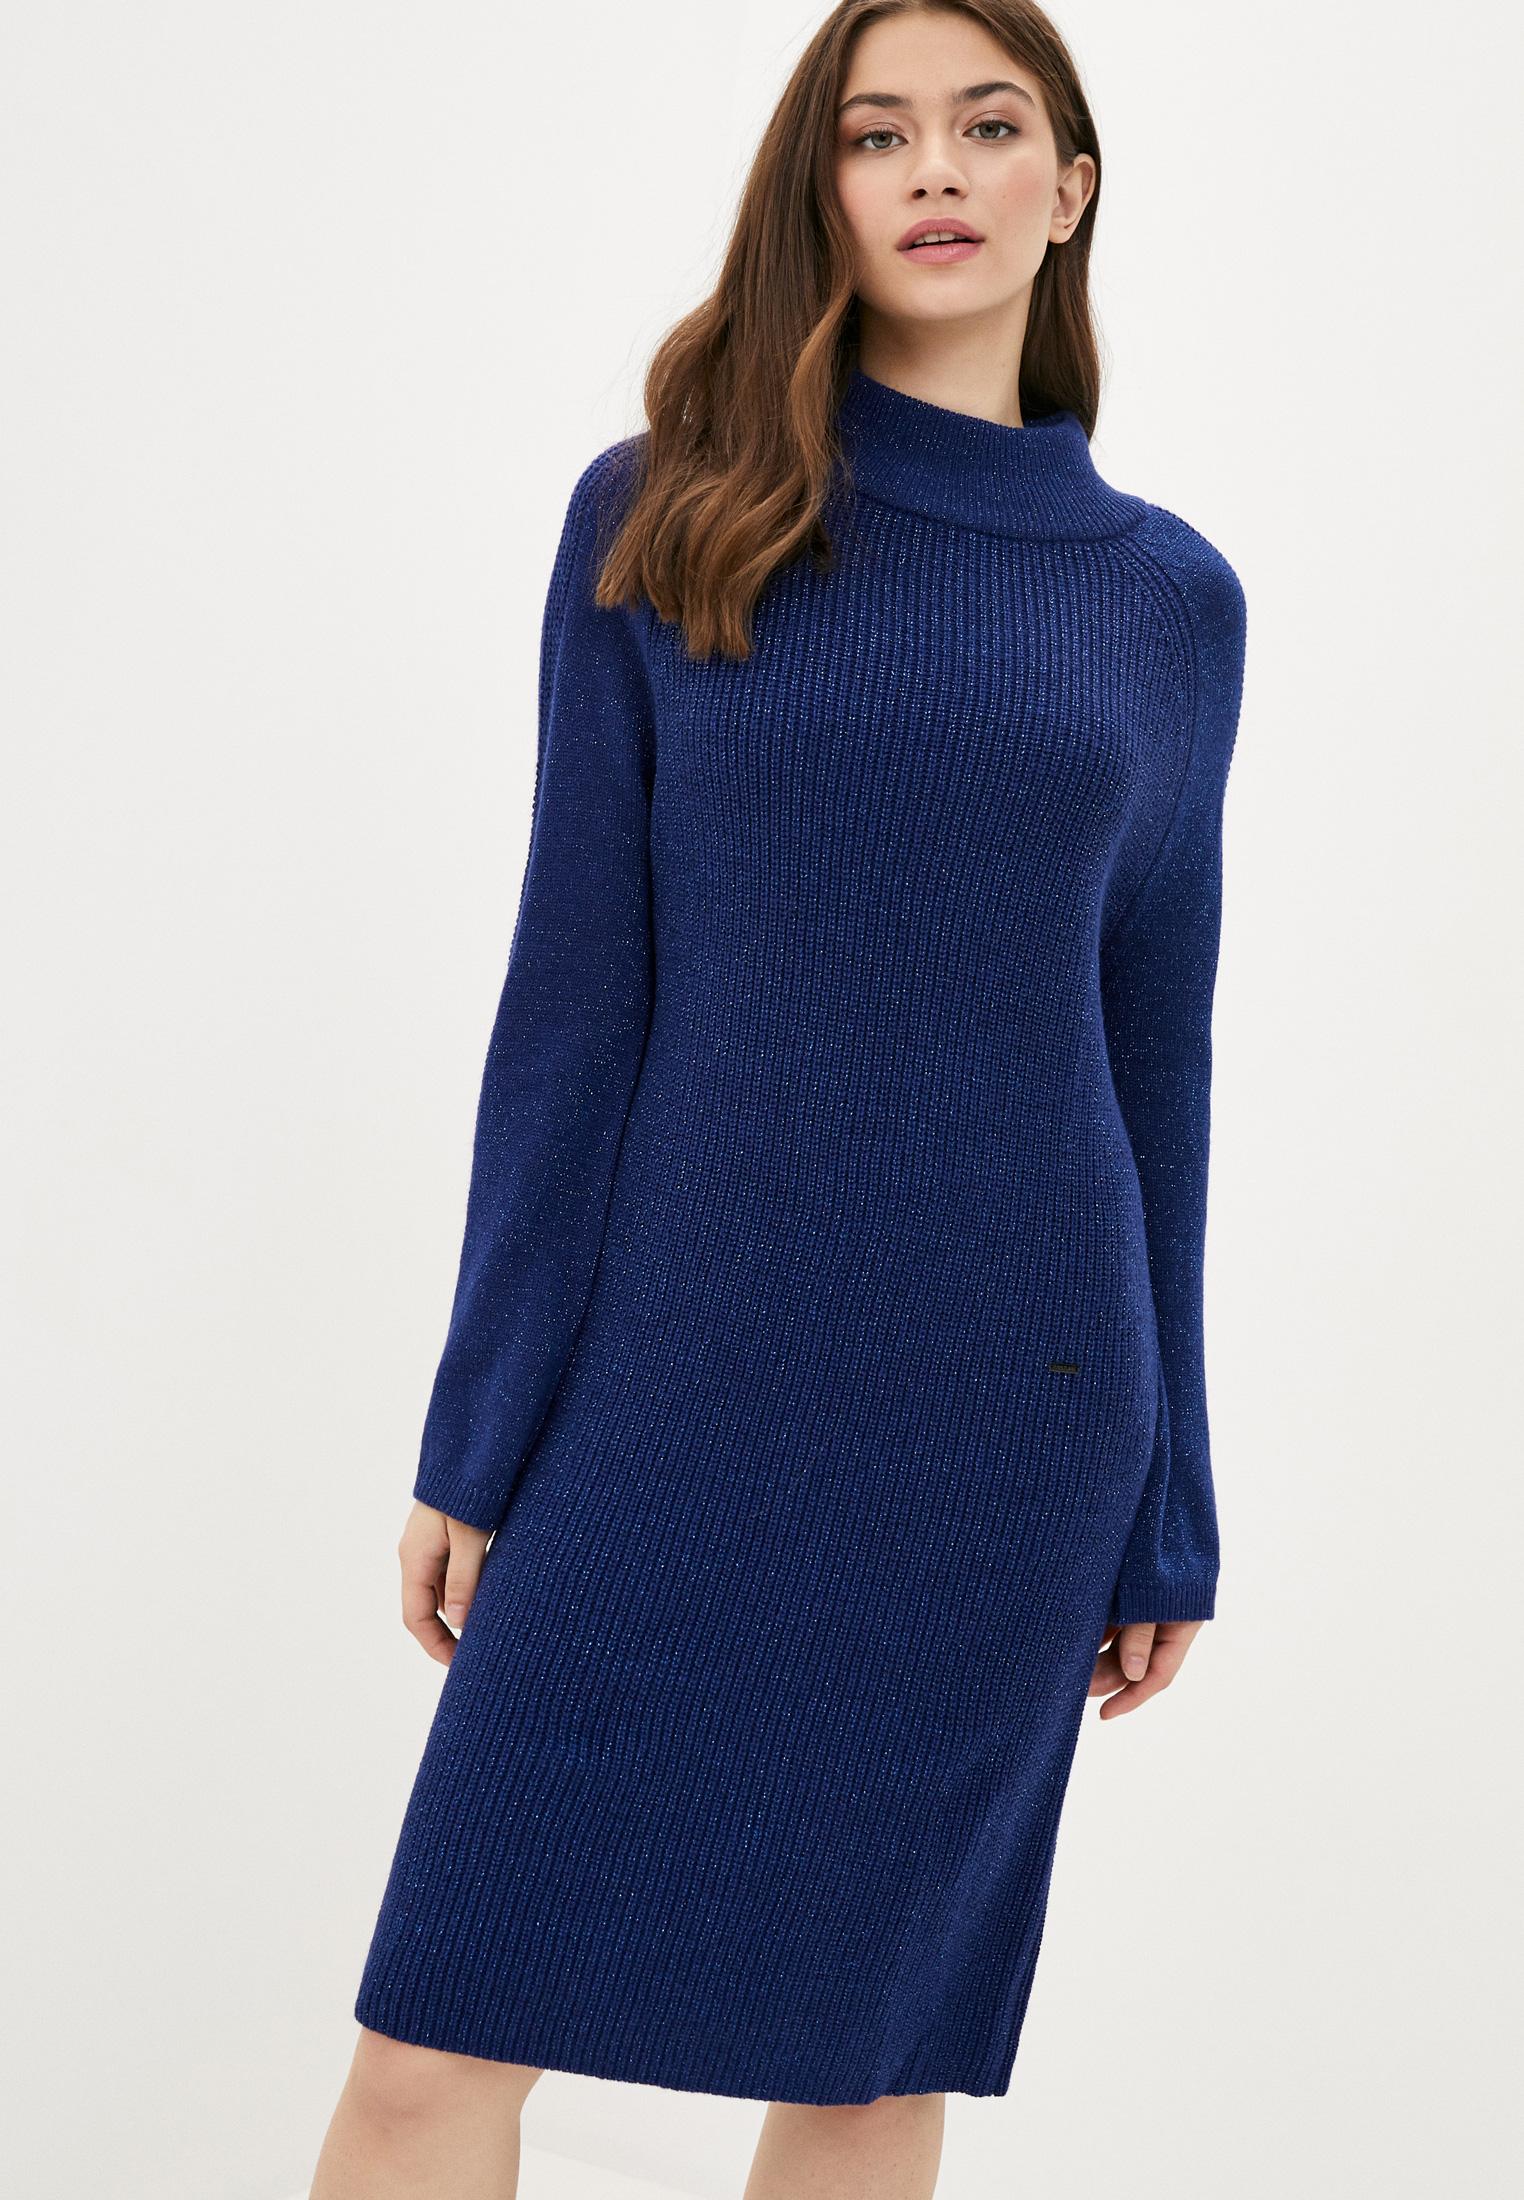 Вязаное платье Finn Flare (Фин Флаер) W19-32113